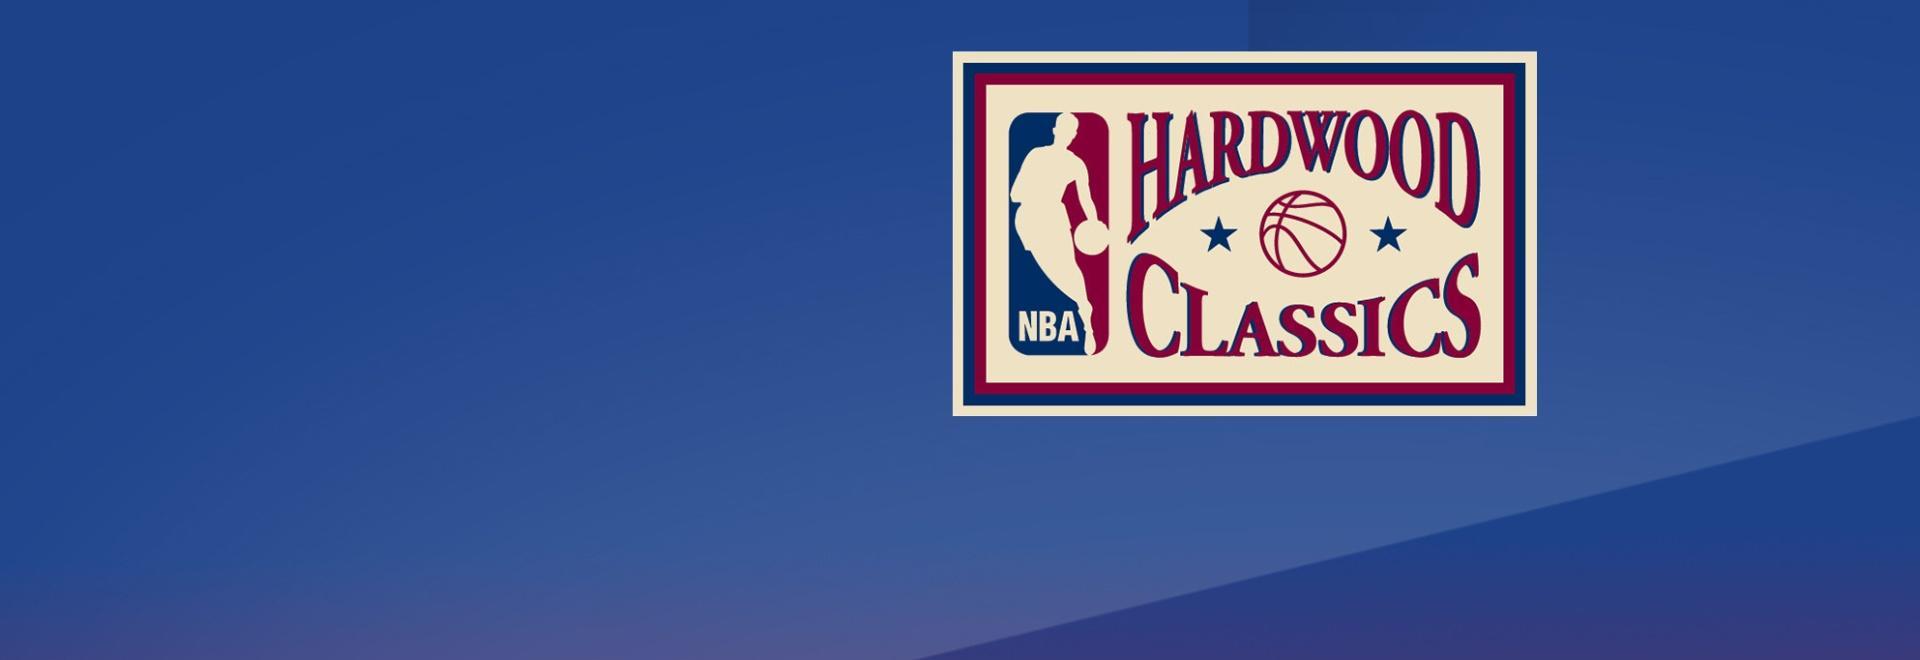 Heat - Mavericks 2006. Game 6. NBA Finals